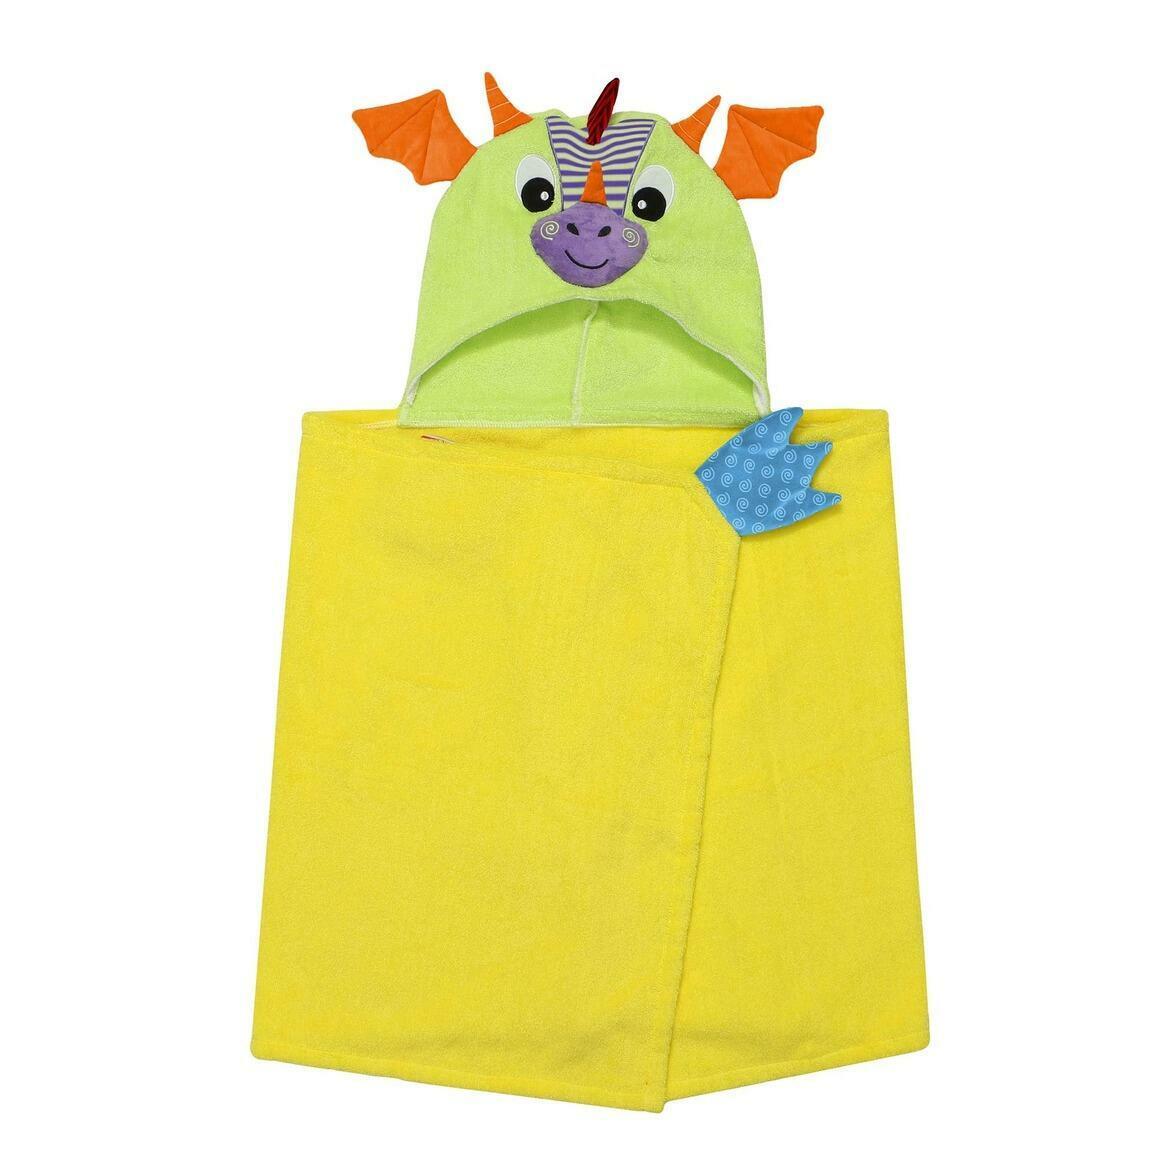 Kids Plus Terry Hooded Bath Towel Dragon 2Y+ | Trada Marketplace